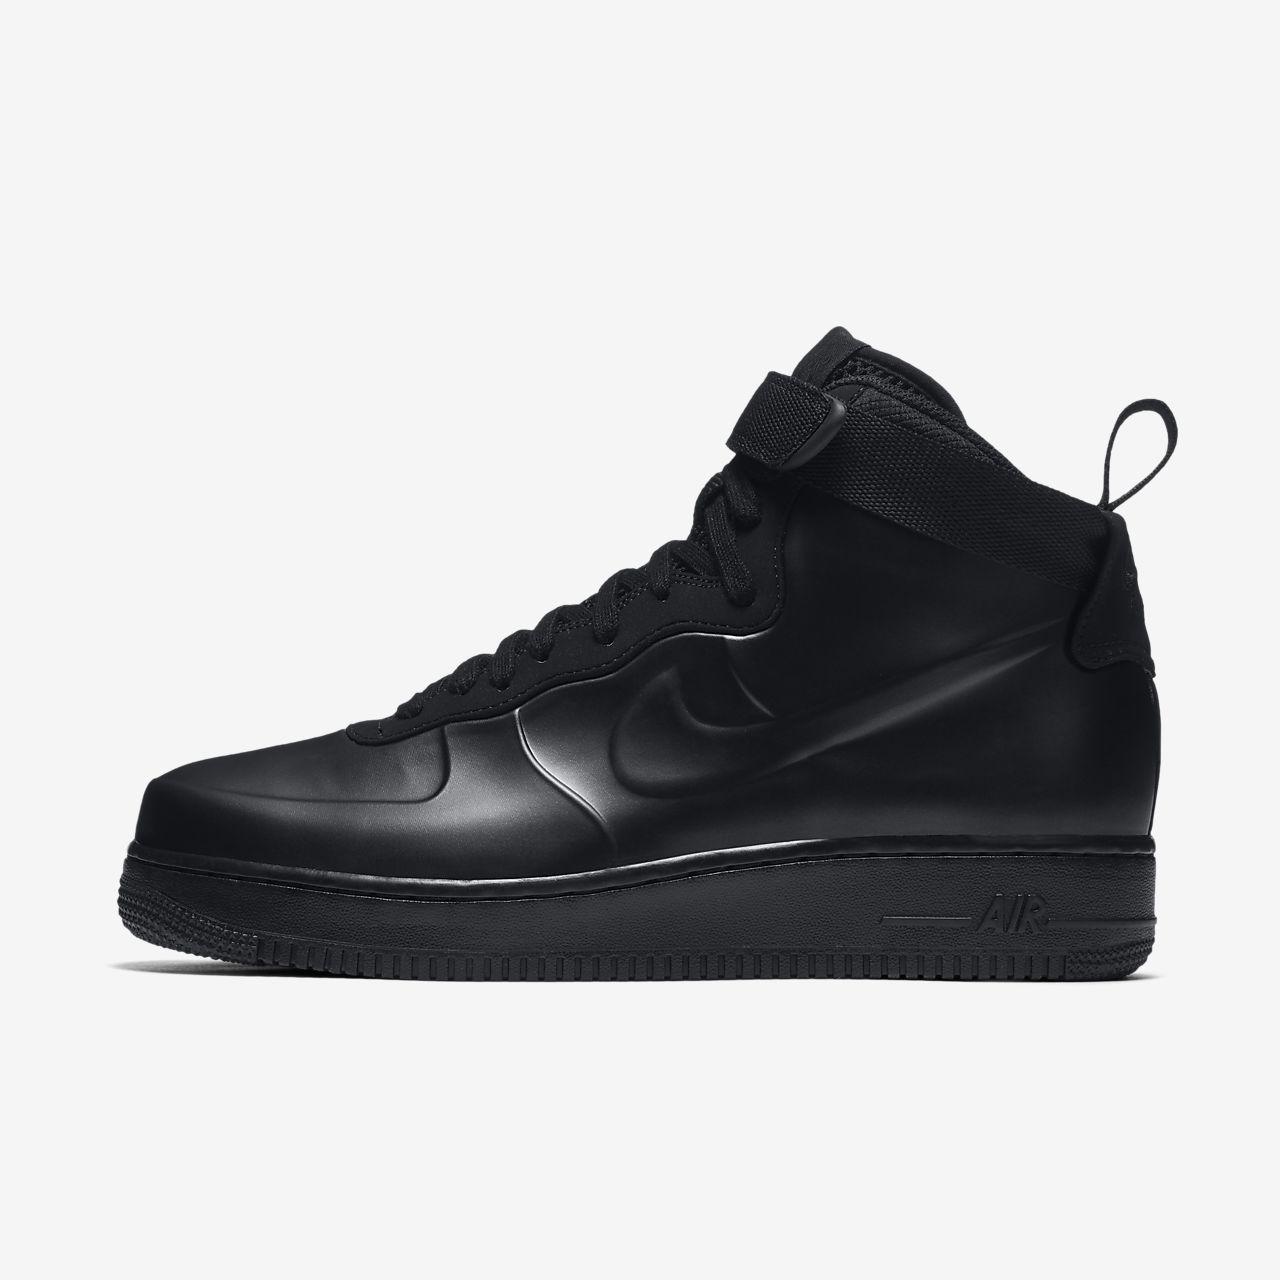 851c9bcde26b4 ... denmark calzado para hombre nike air force 1 foamposite cupsole ecc2a  7b7bf